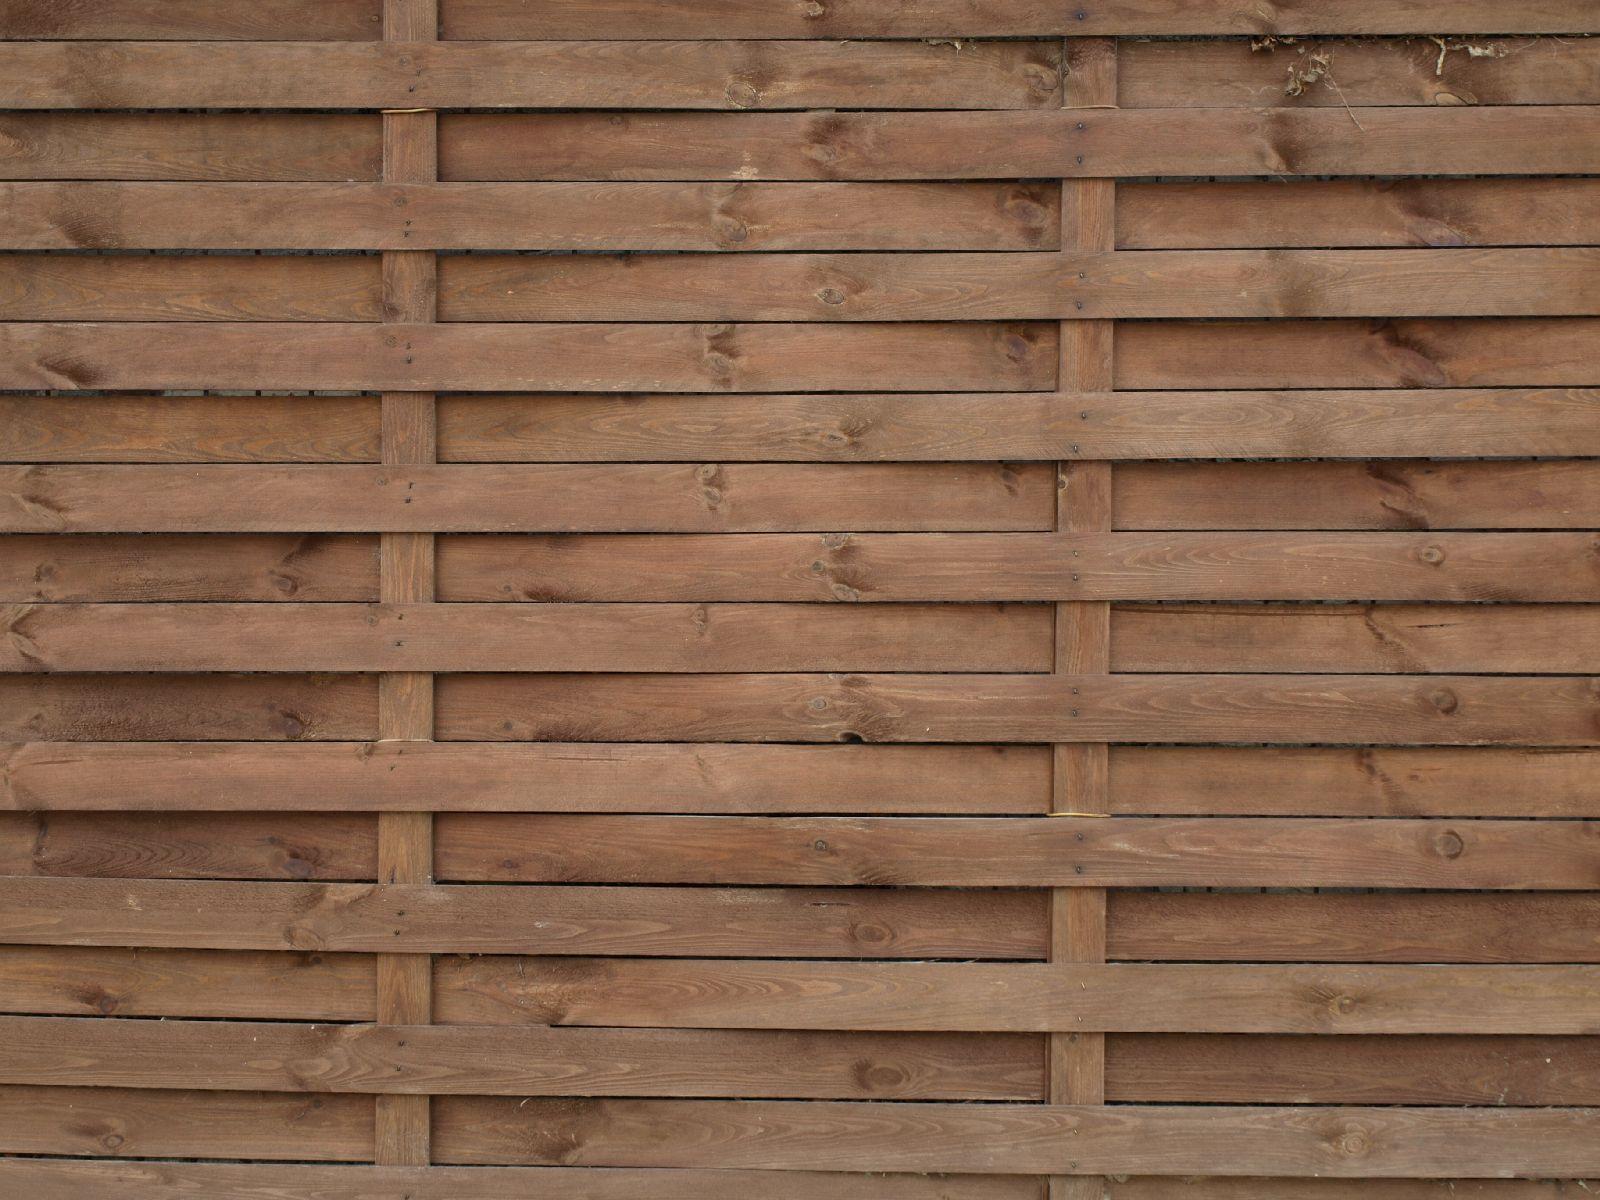 Wood_Texture_A_P4110743